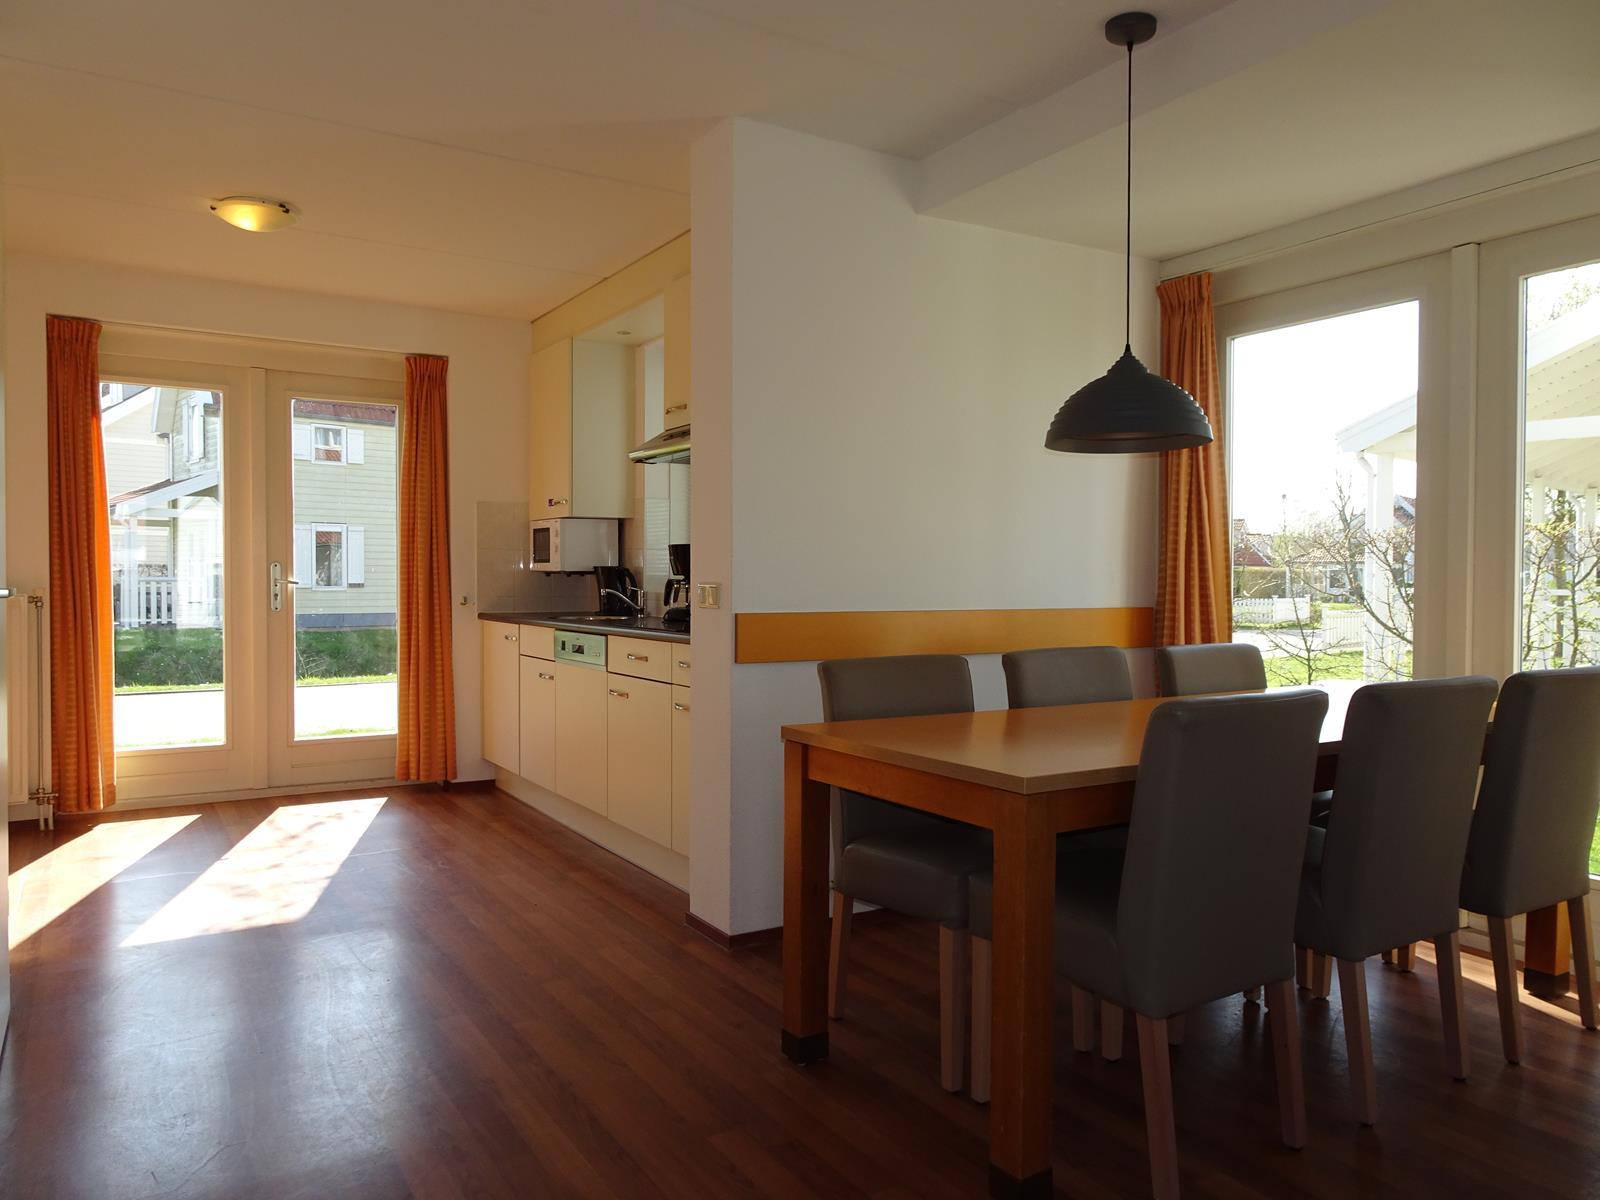 Vakantiehuis te koop Zeeland Bruinisse K41 (10).jpg